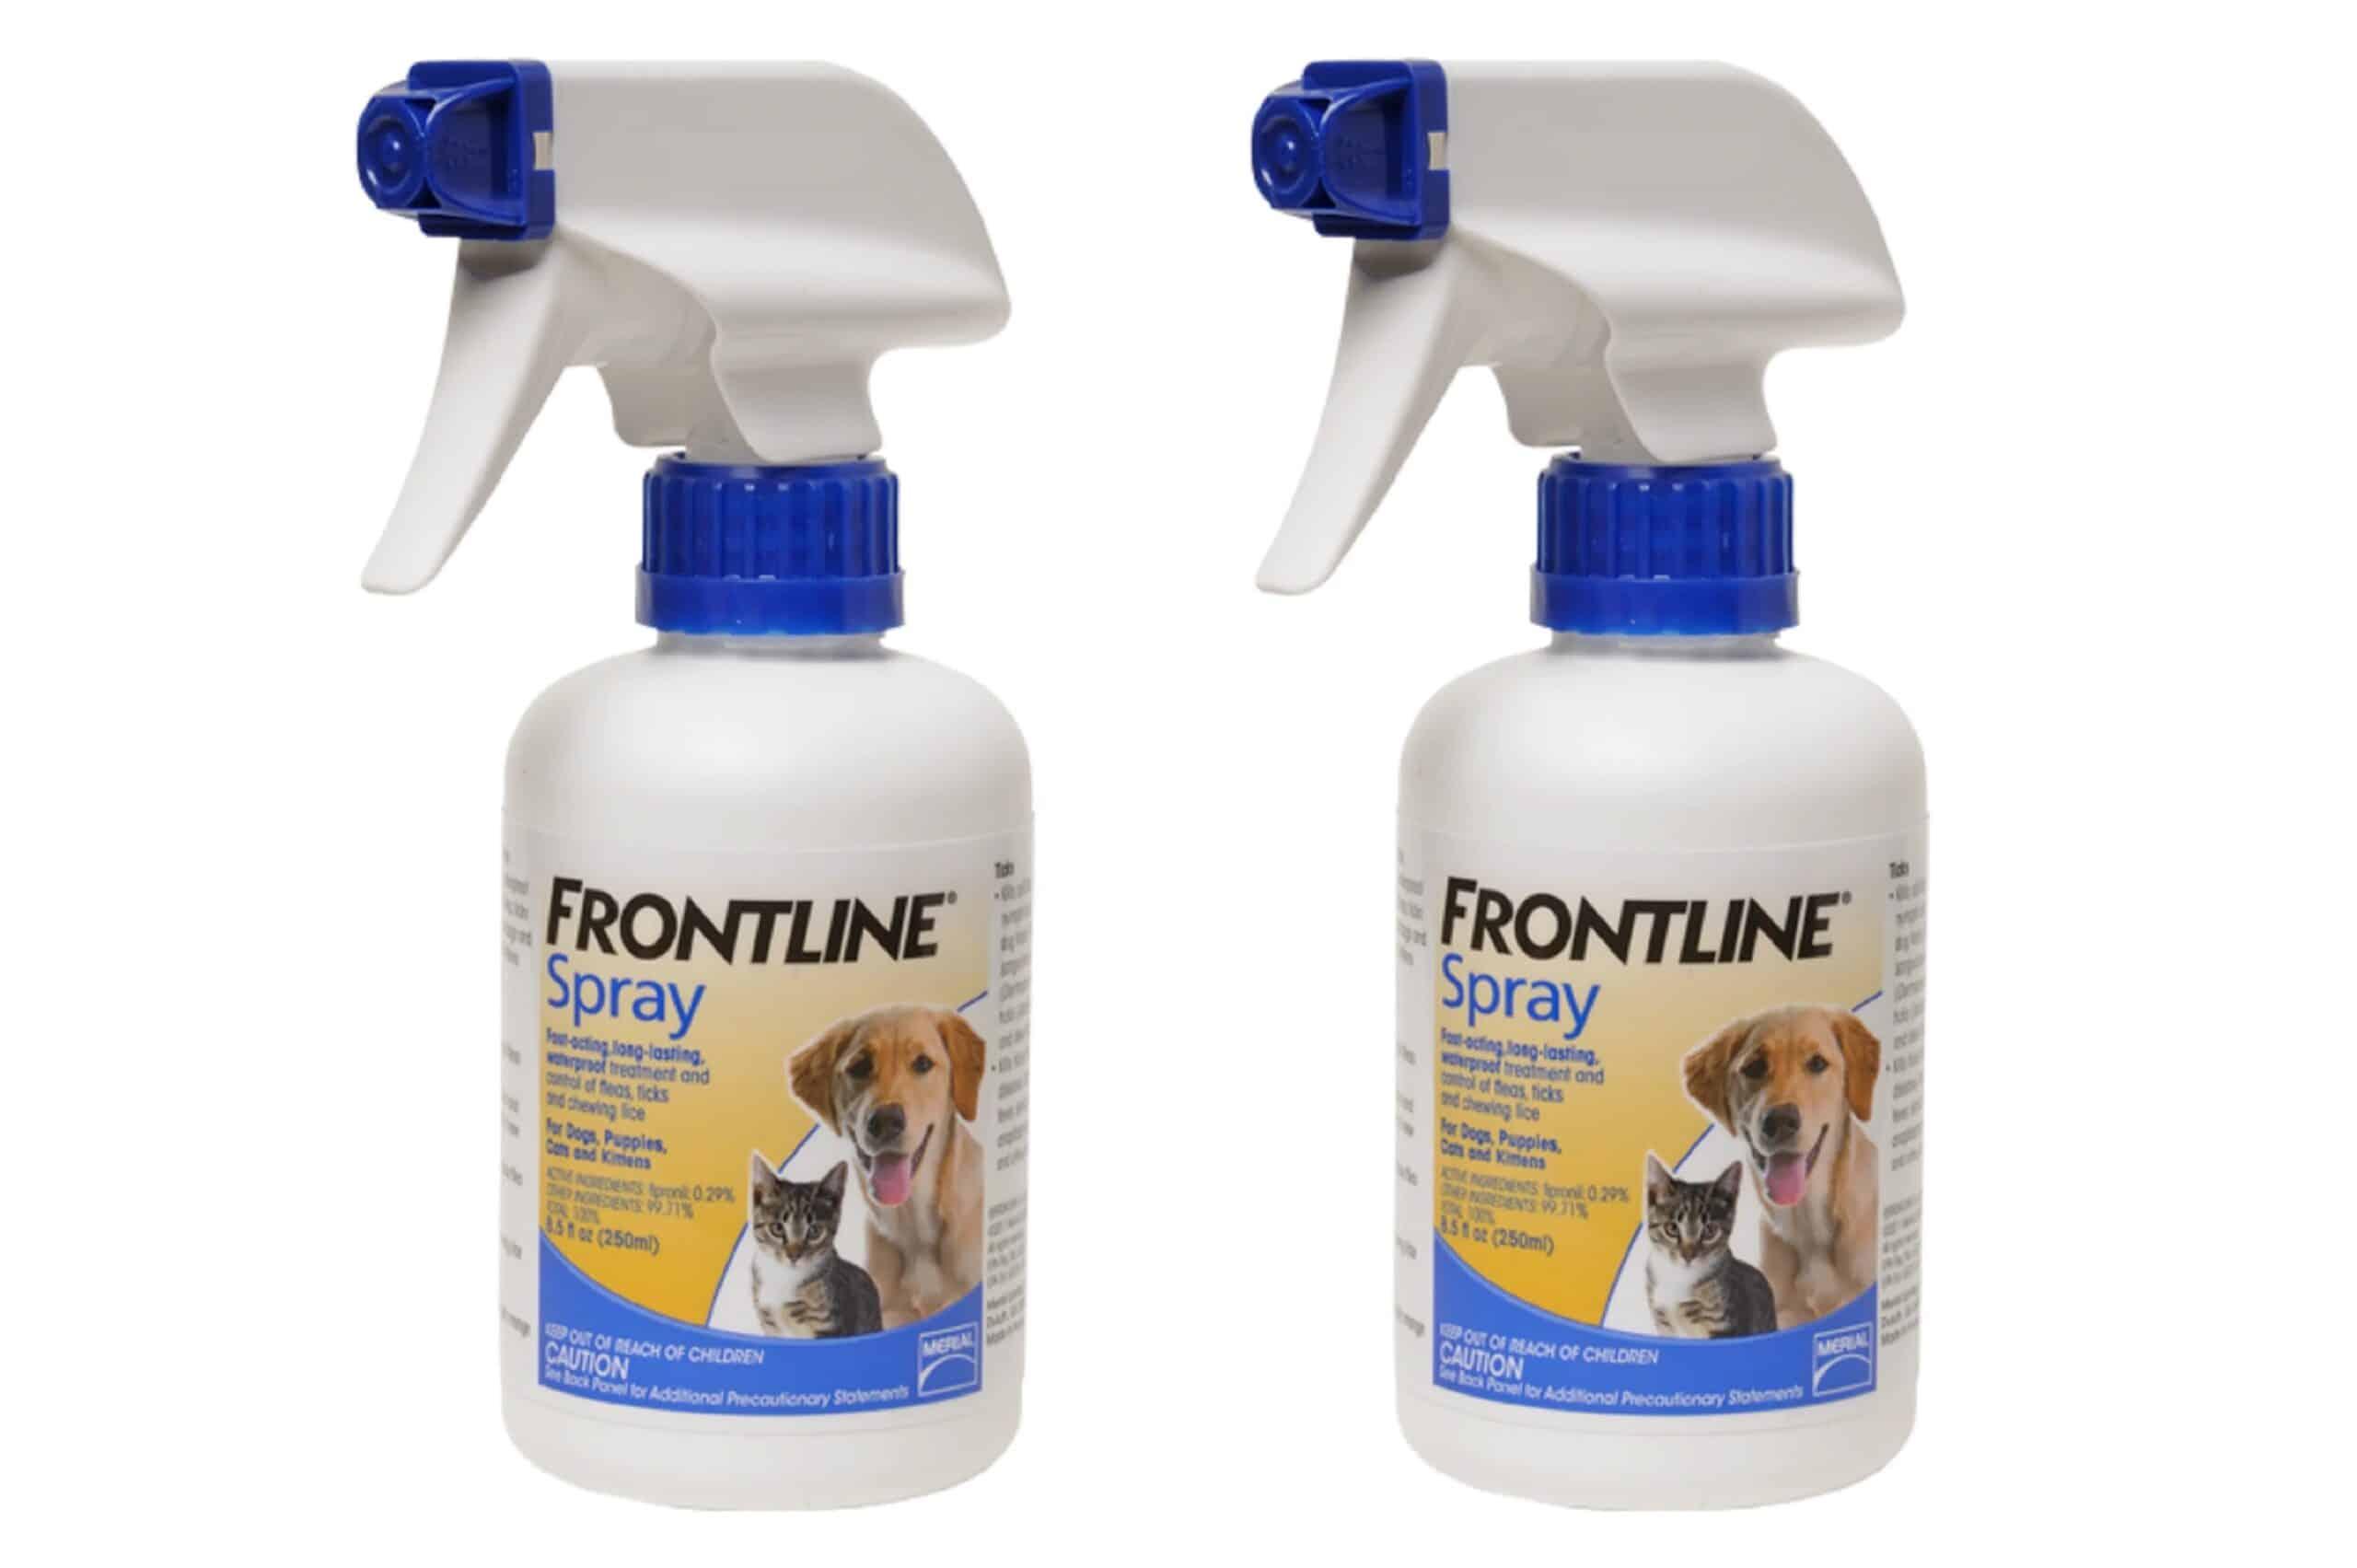 Frontline-Flea-and-Tick-Spray